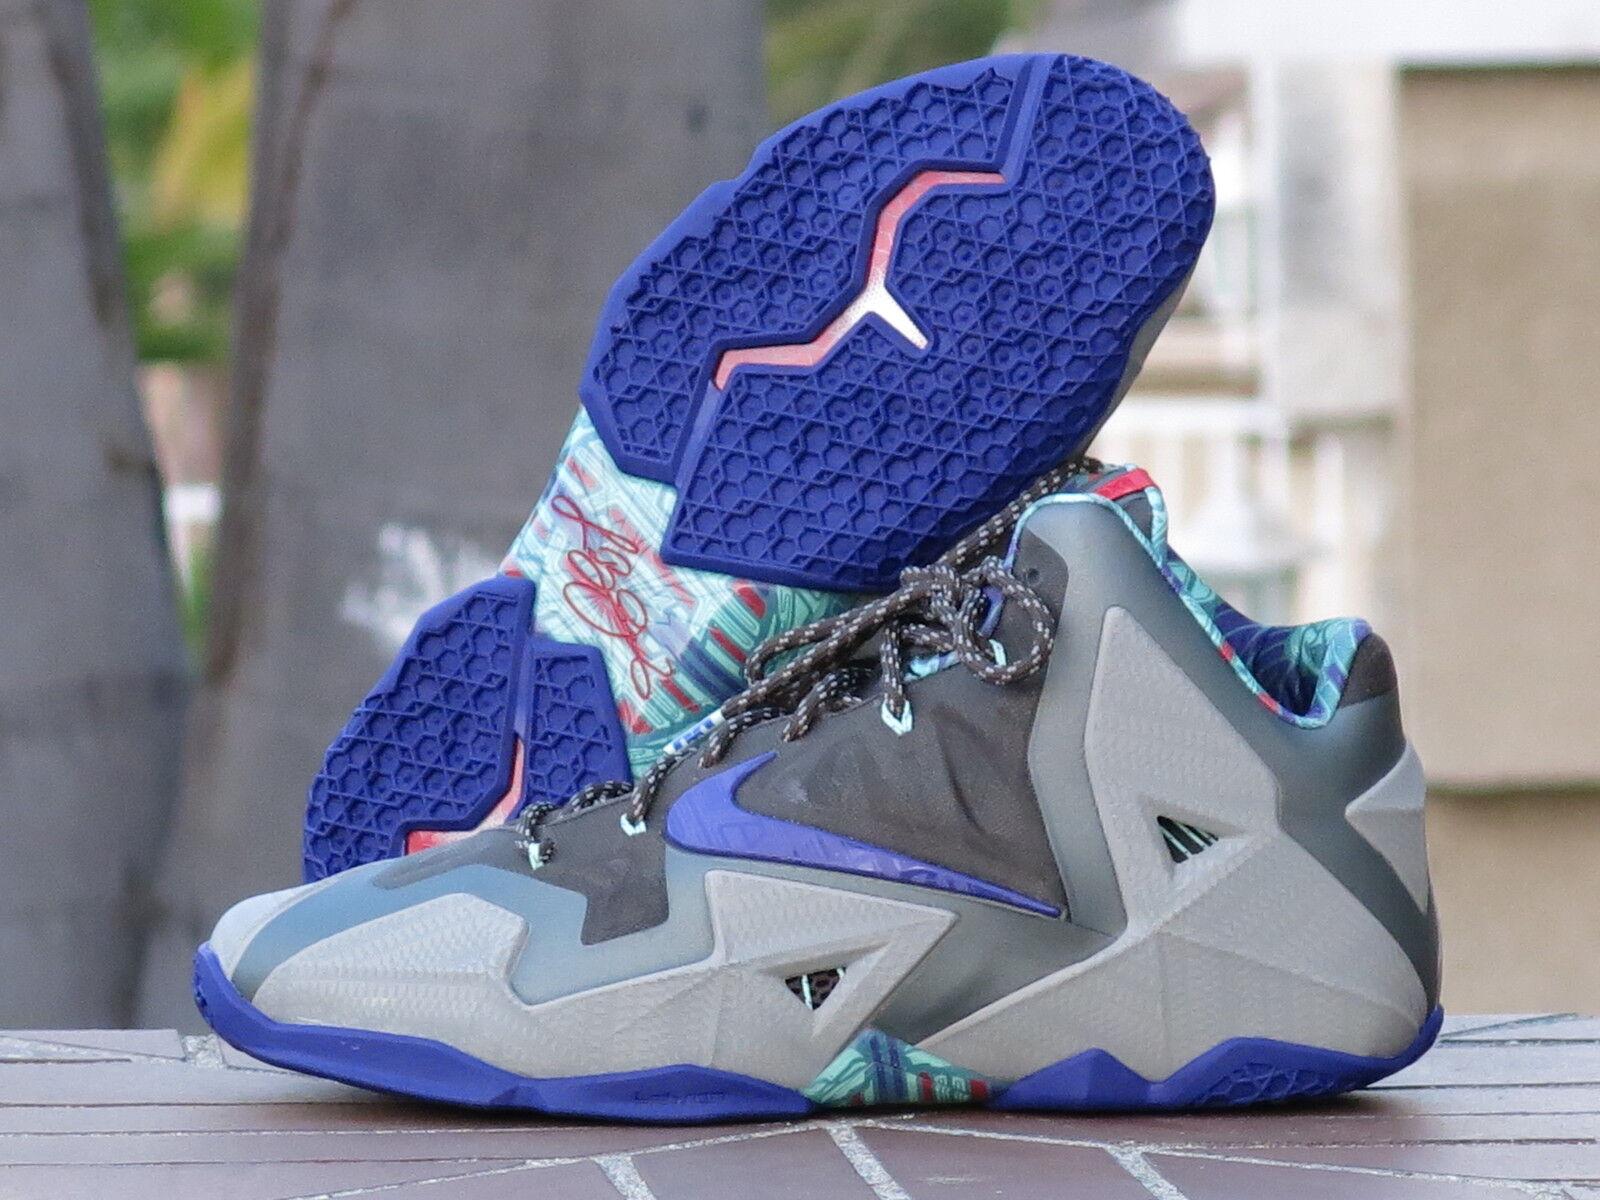 2013 Nike Lebron XI 11 Terracota Warrior Men's Basketball Shoes 616175-005 SZ 14